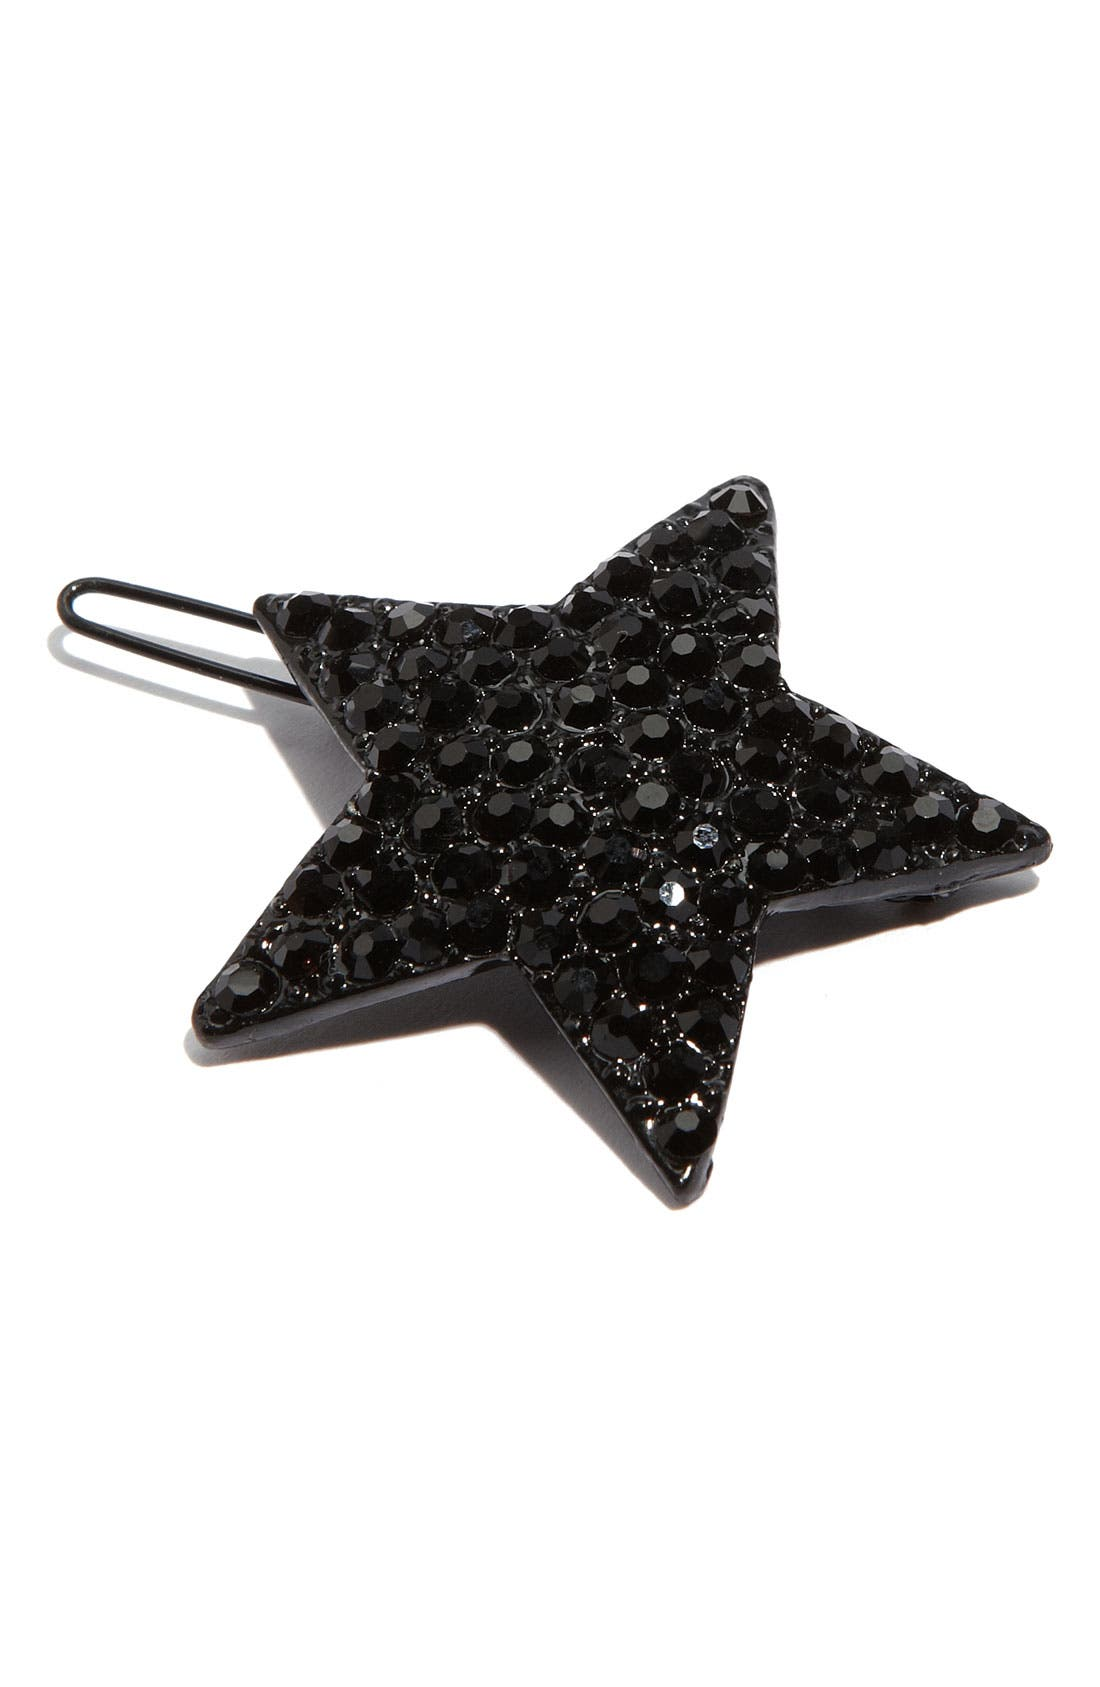 Alternate Image 1 Selected - Tasha 'Glitz' Star Barrette